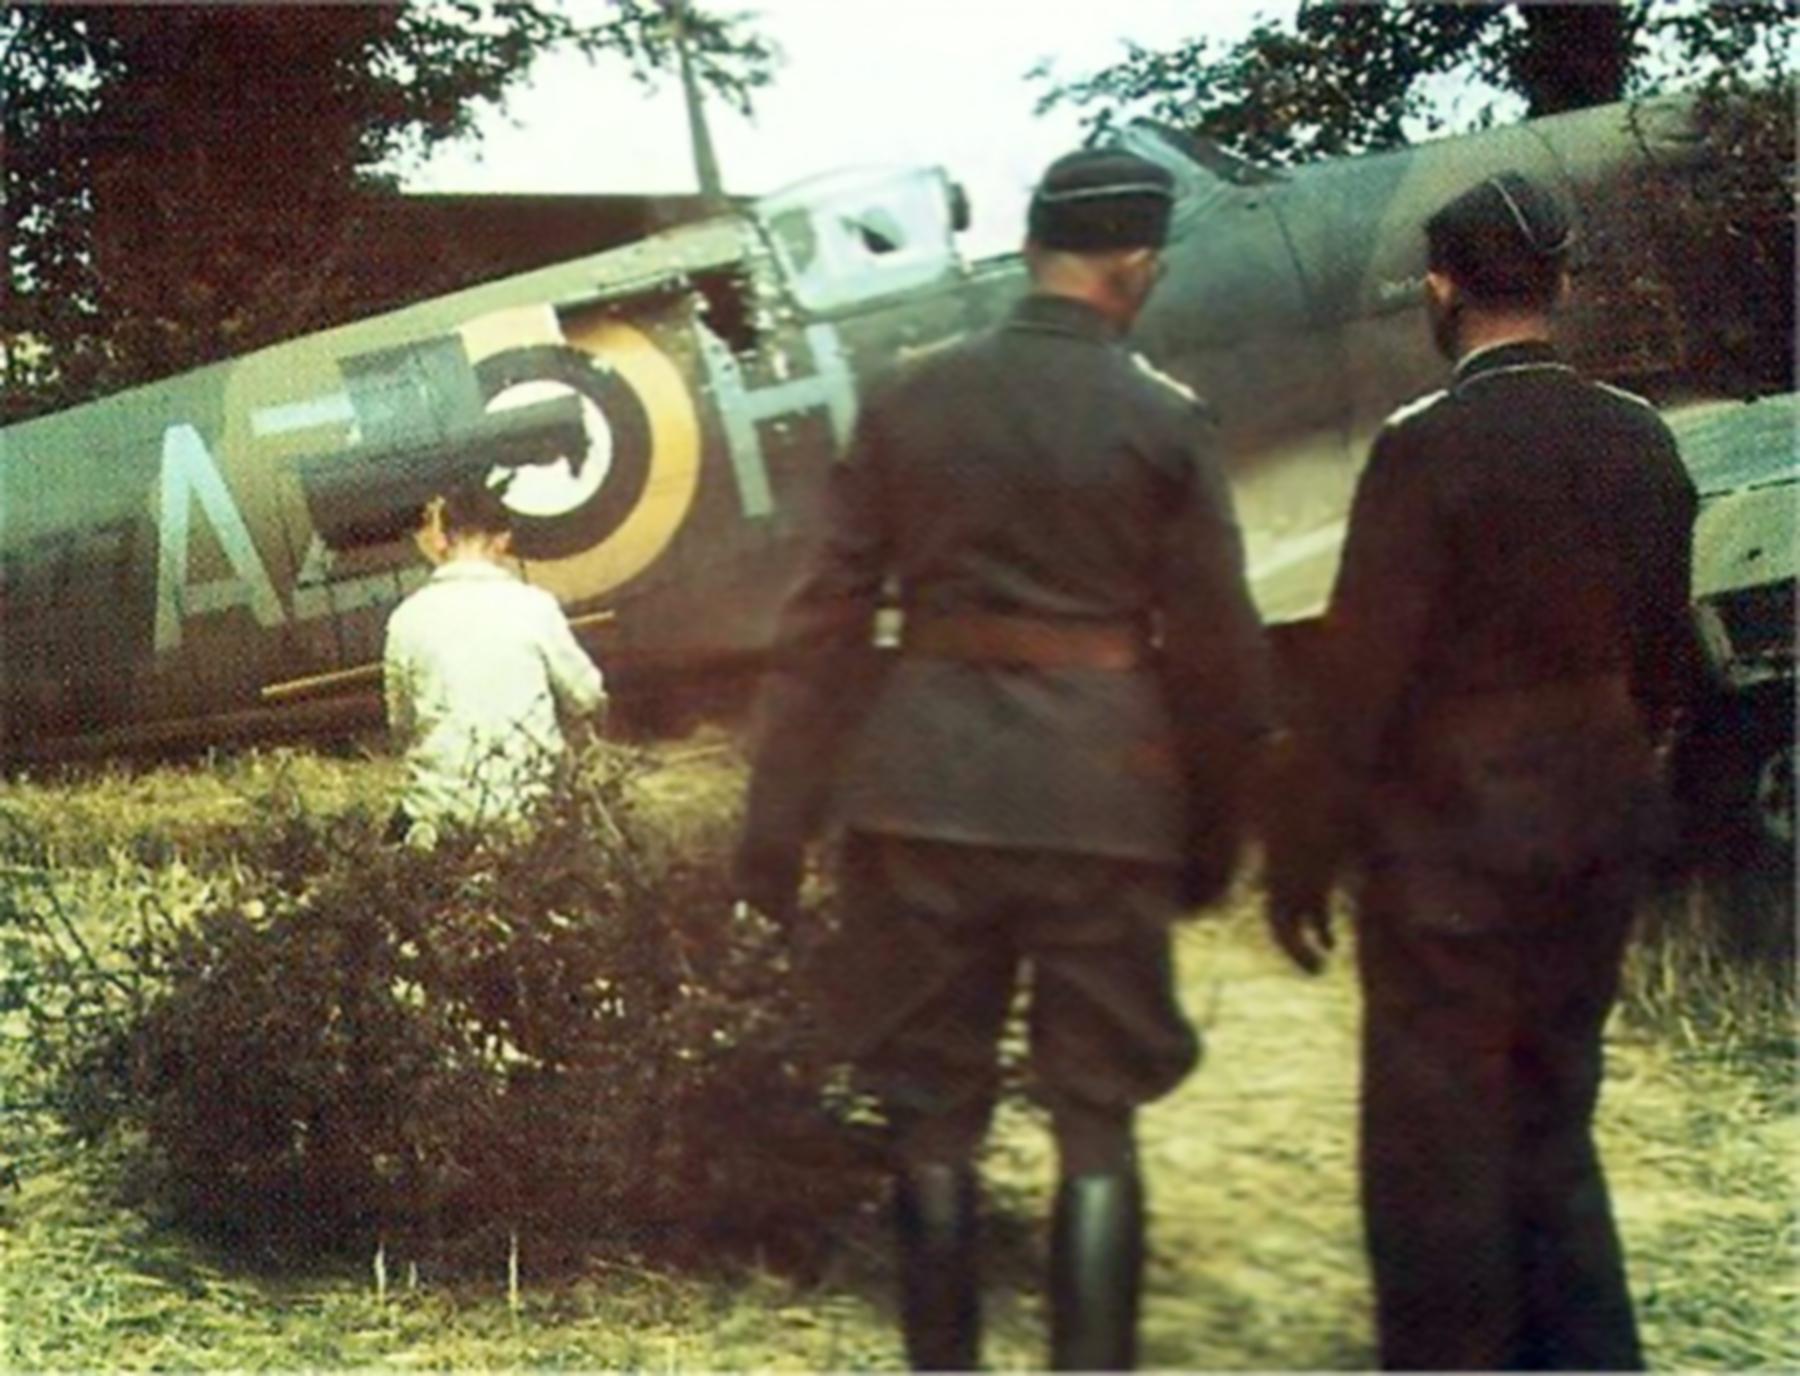 Spitfire MkIa RAF 234Sqn AZH Richard Hardy N3277 forced landed Cherbourg France Aug 15 1940 05